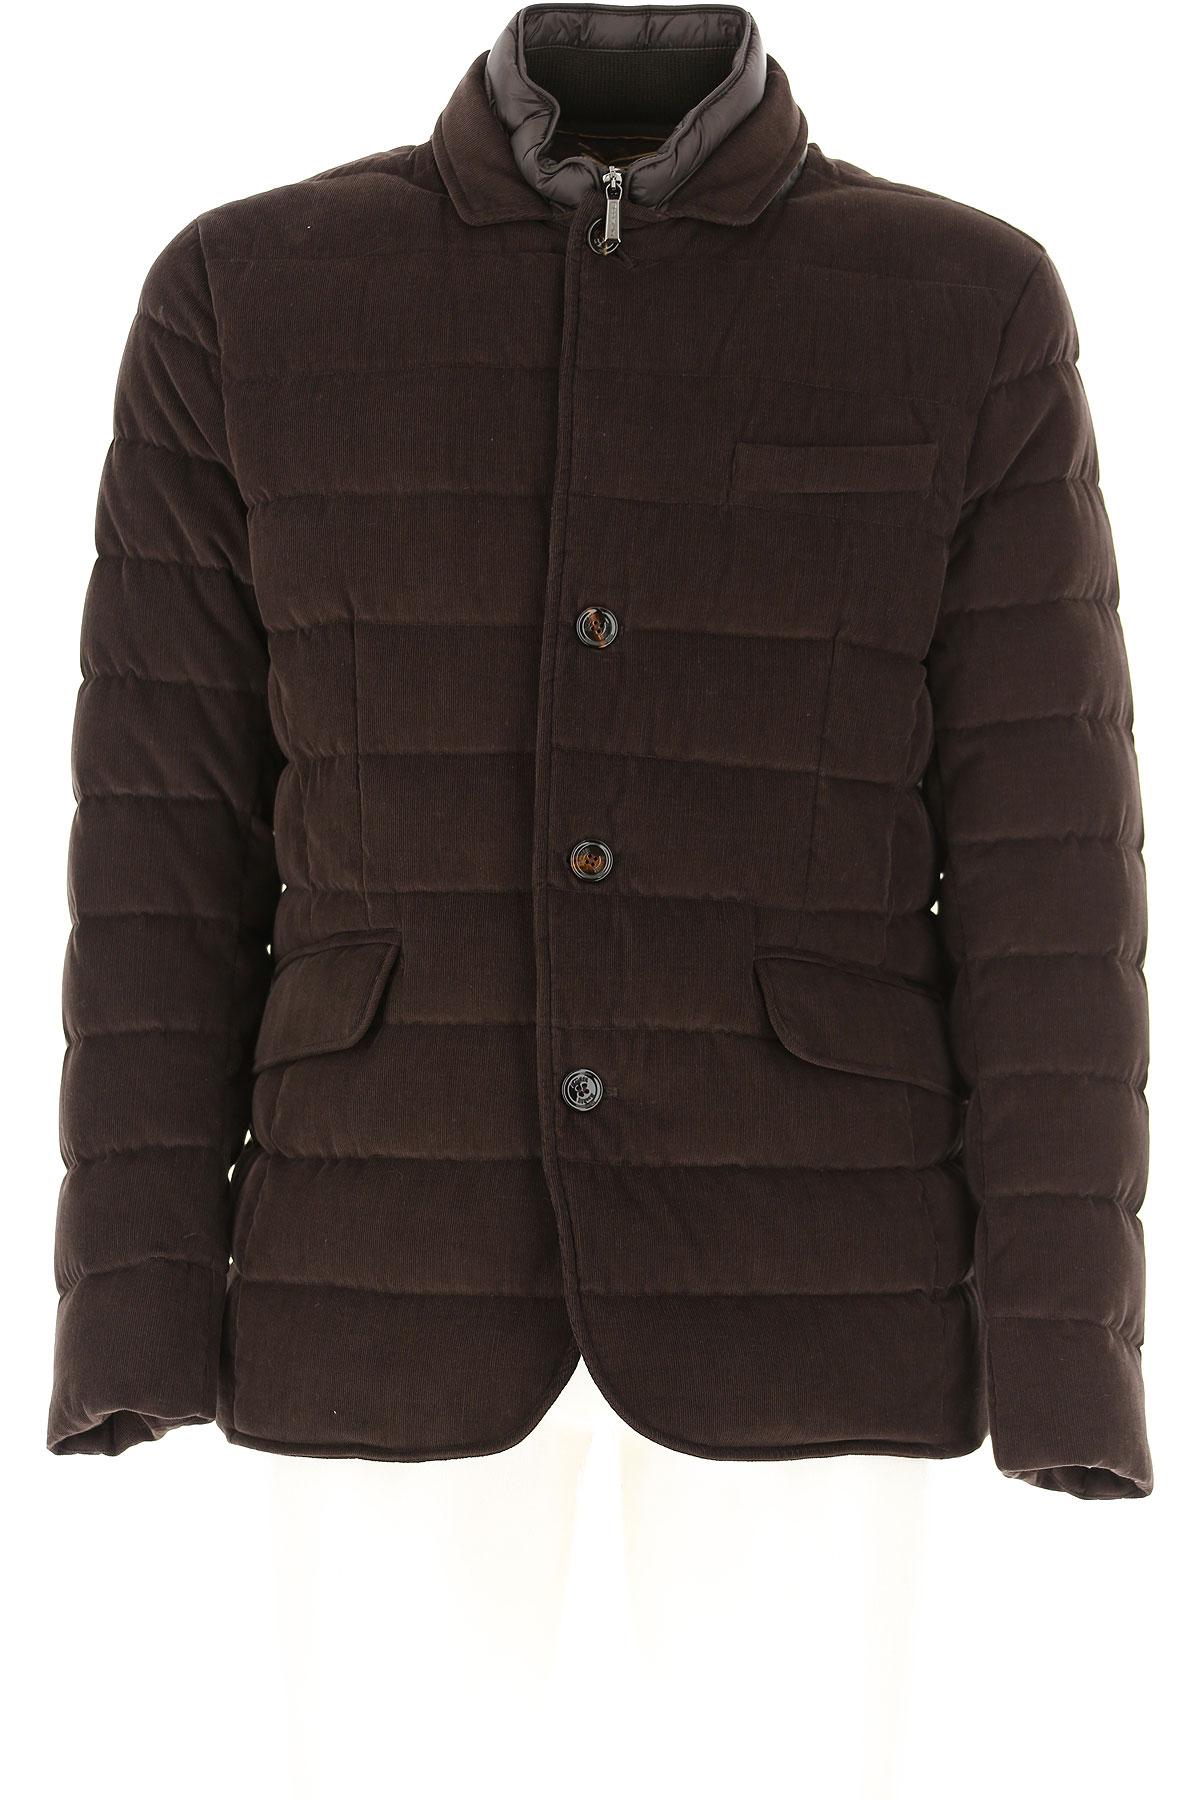 Moorer Down Jacket for Men, Puffer Ski Jacket On Sale, Moro, Cotton, 2019, L M XL